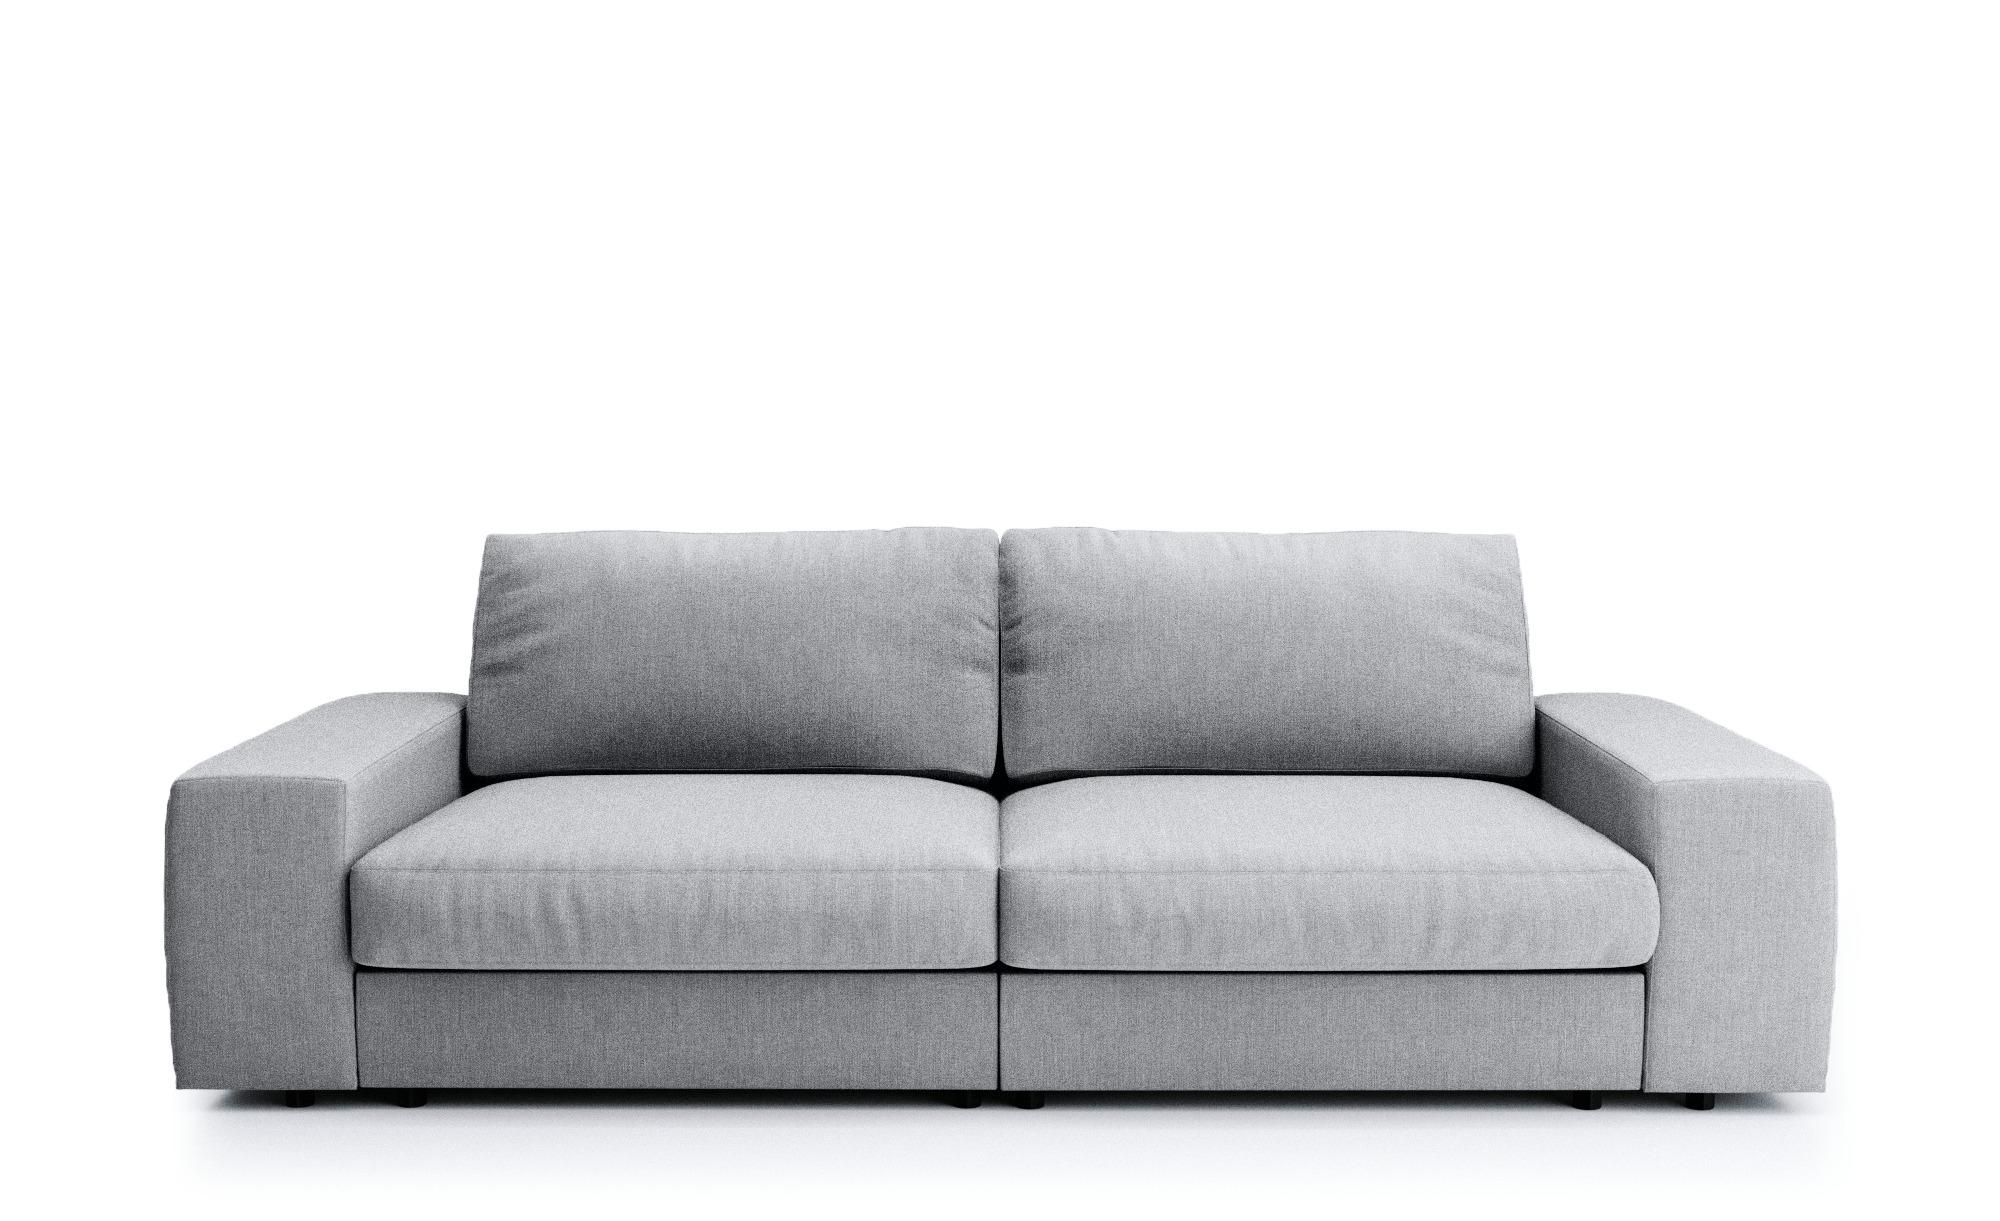 Big Sofa - grau - 262 cm - 88 cm - 120 cm - Polstermöbel > Sofas > Big-Sofas - Möbel Kraft